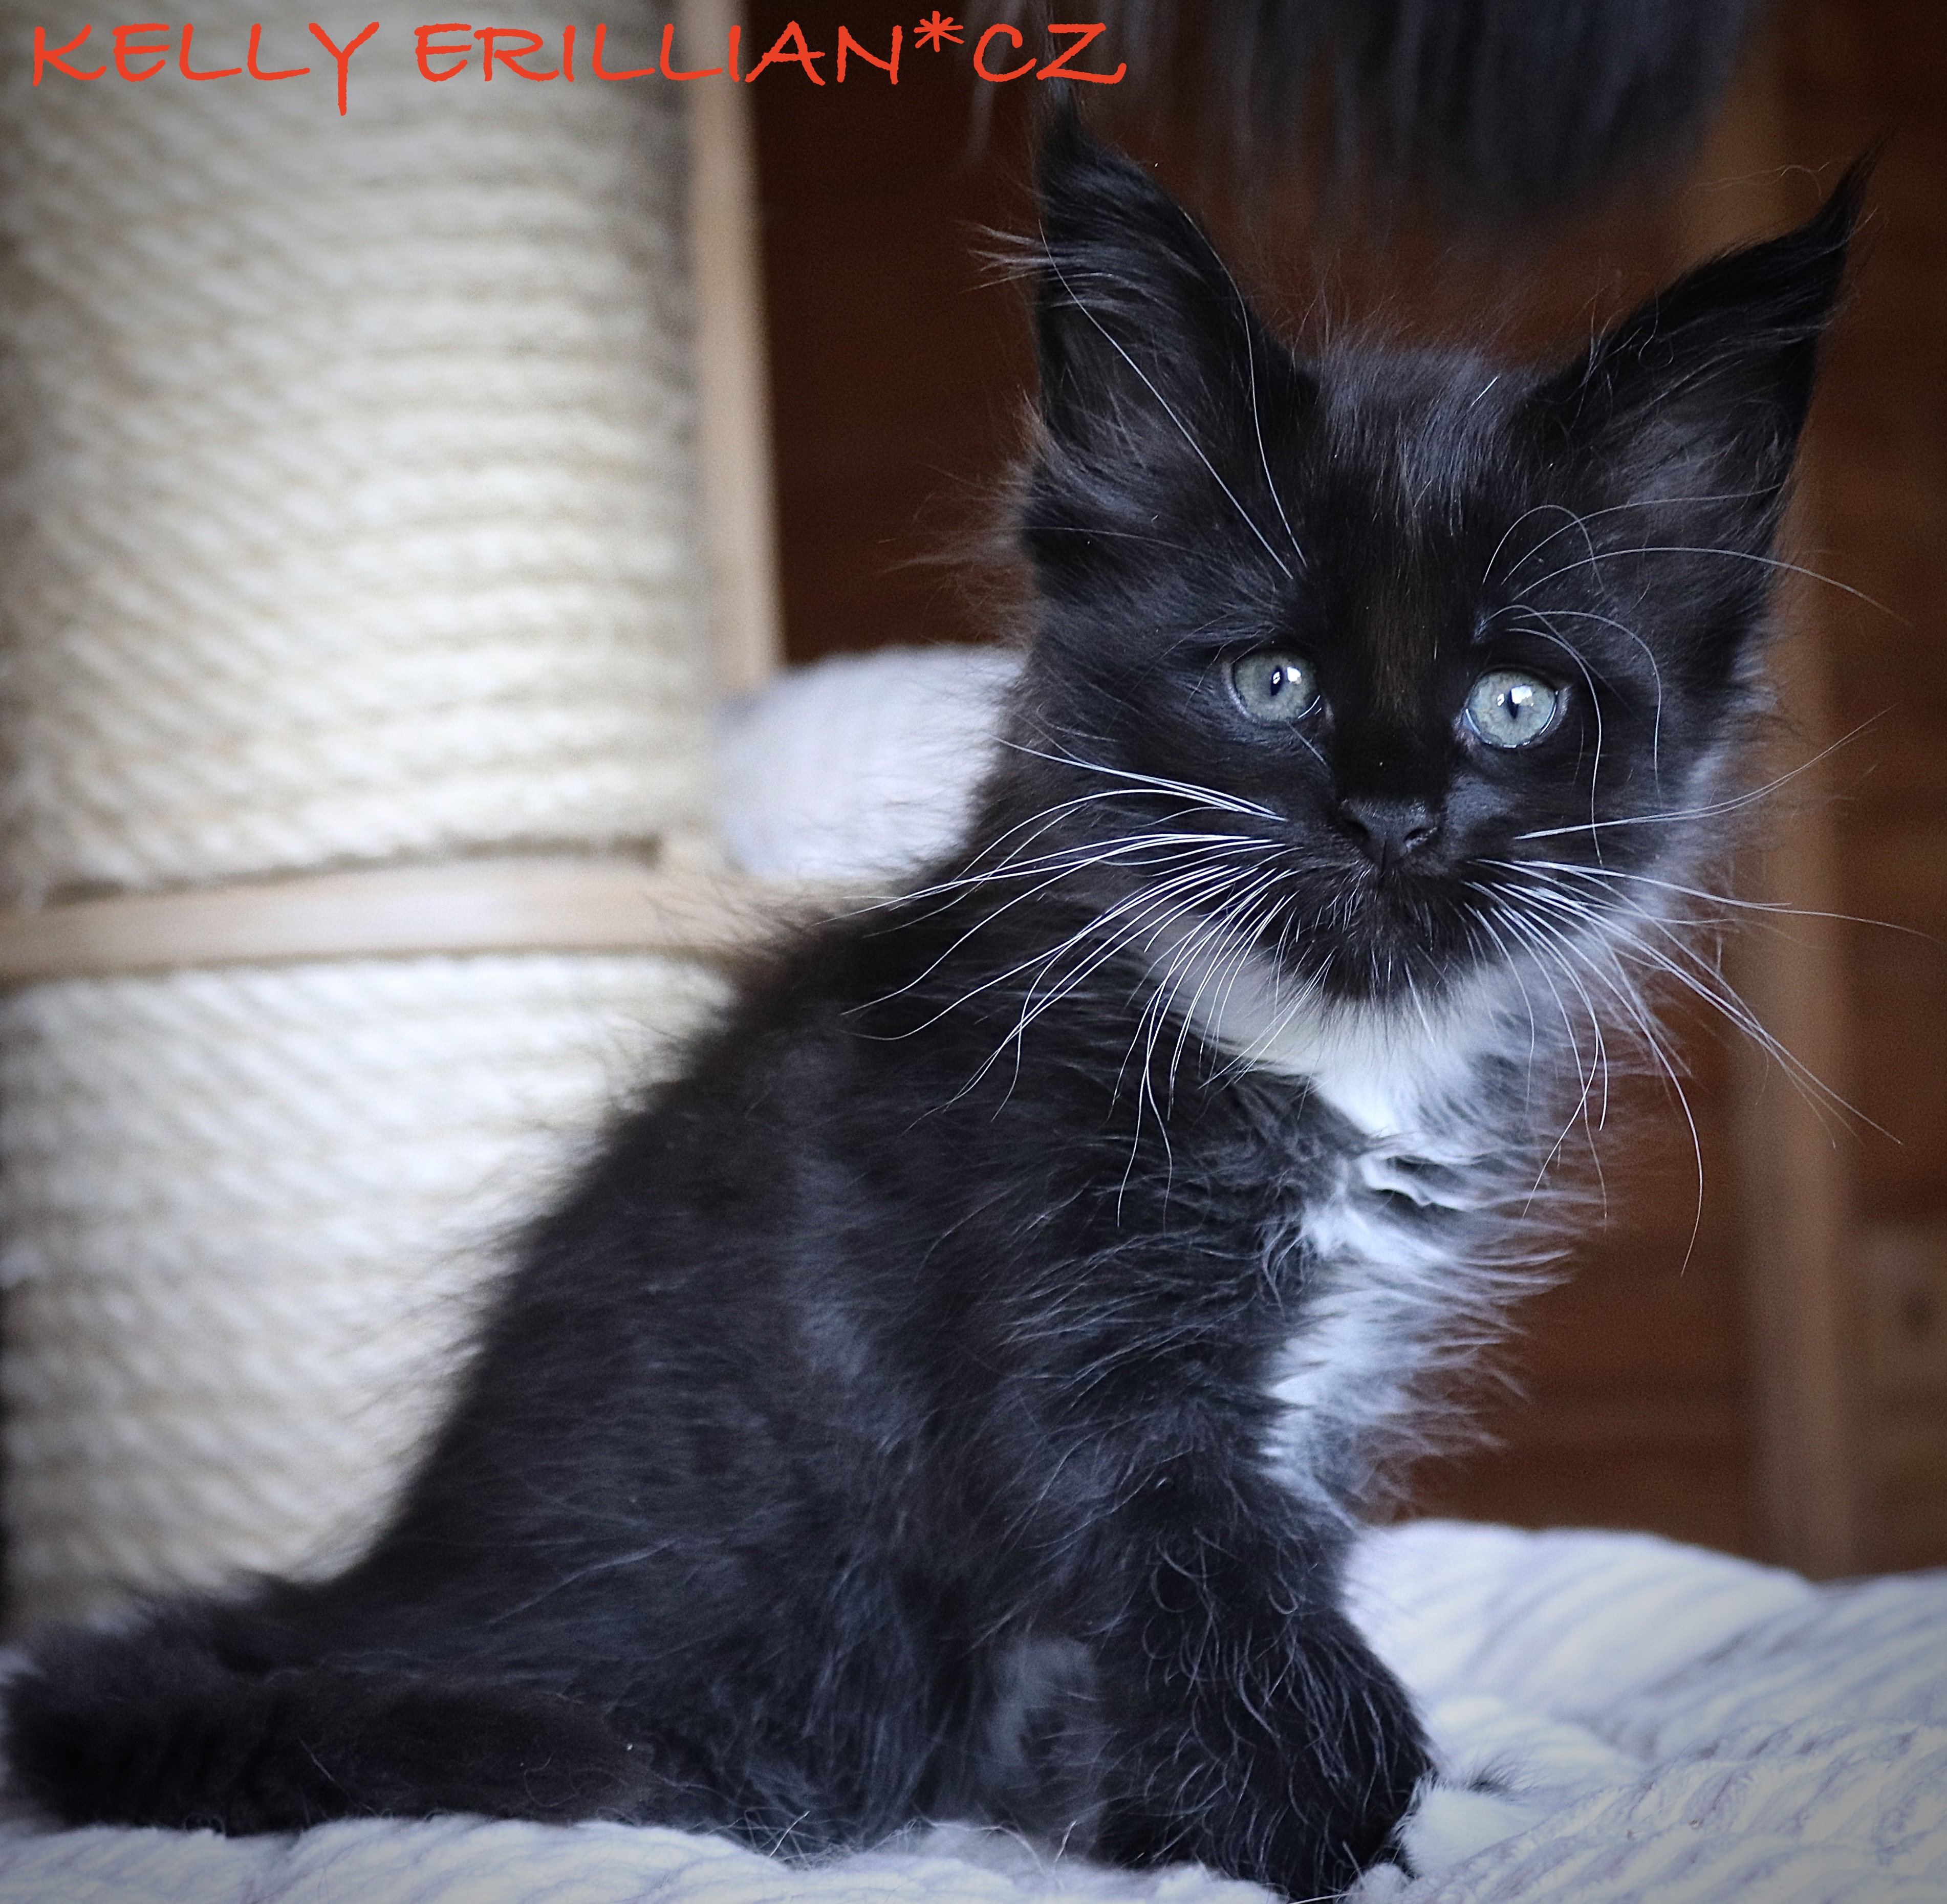 fotka kočky VRH K: KELLY VON ERILLIAN*CZ